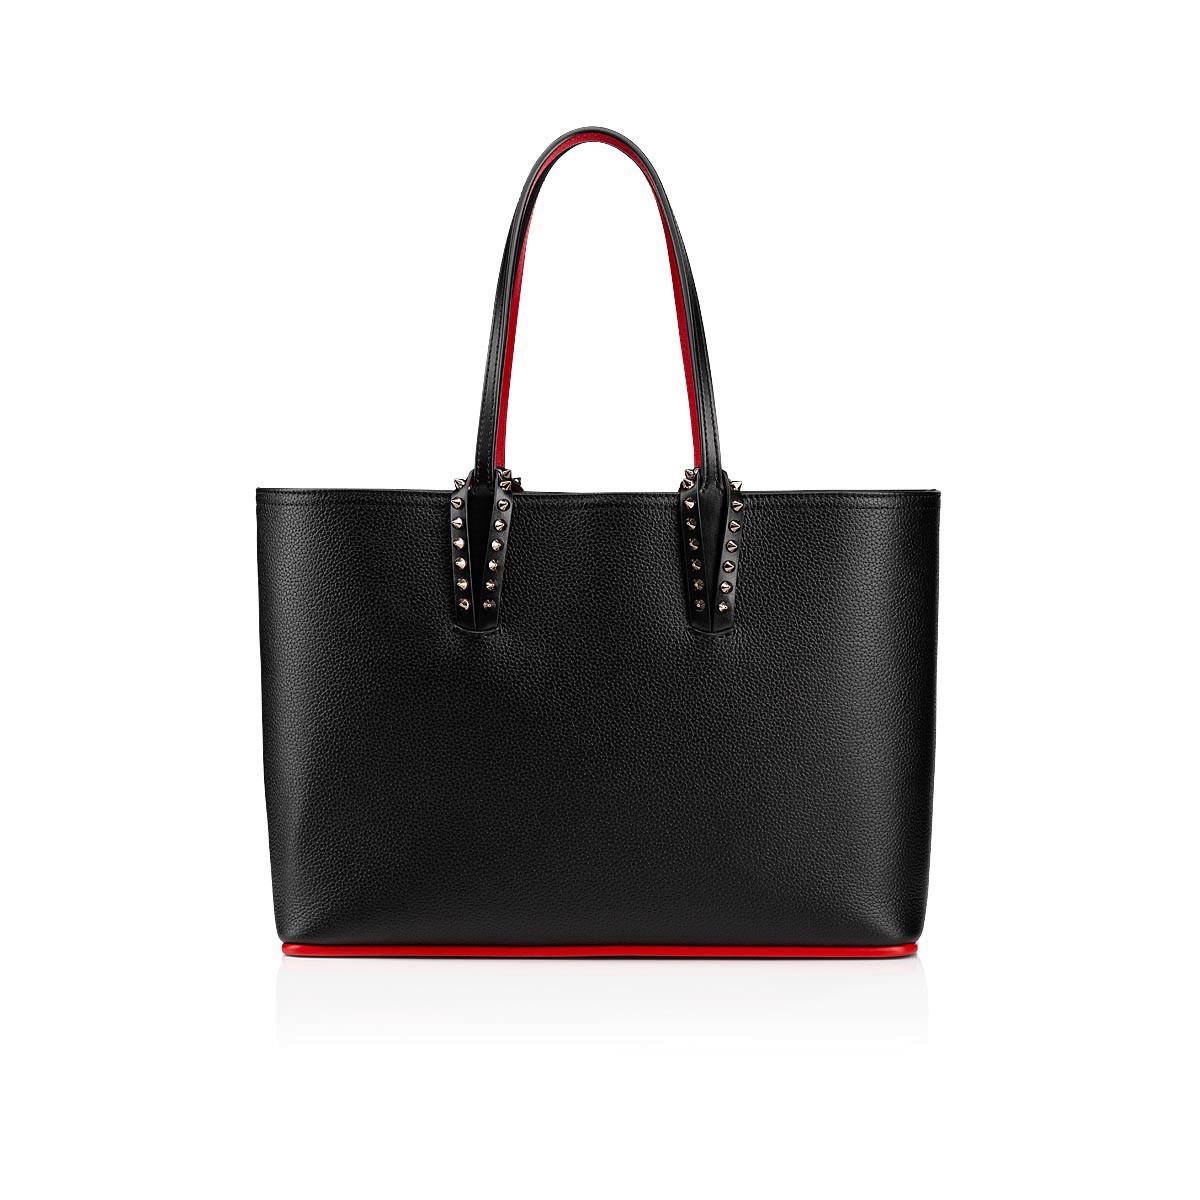 Bags - Cabata Small - Christian Louboutin